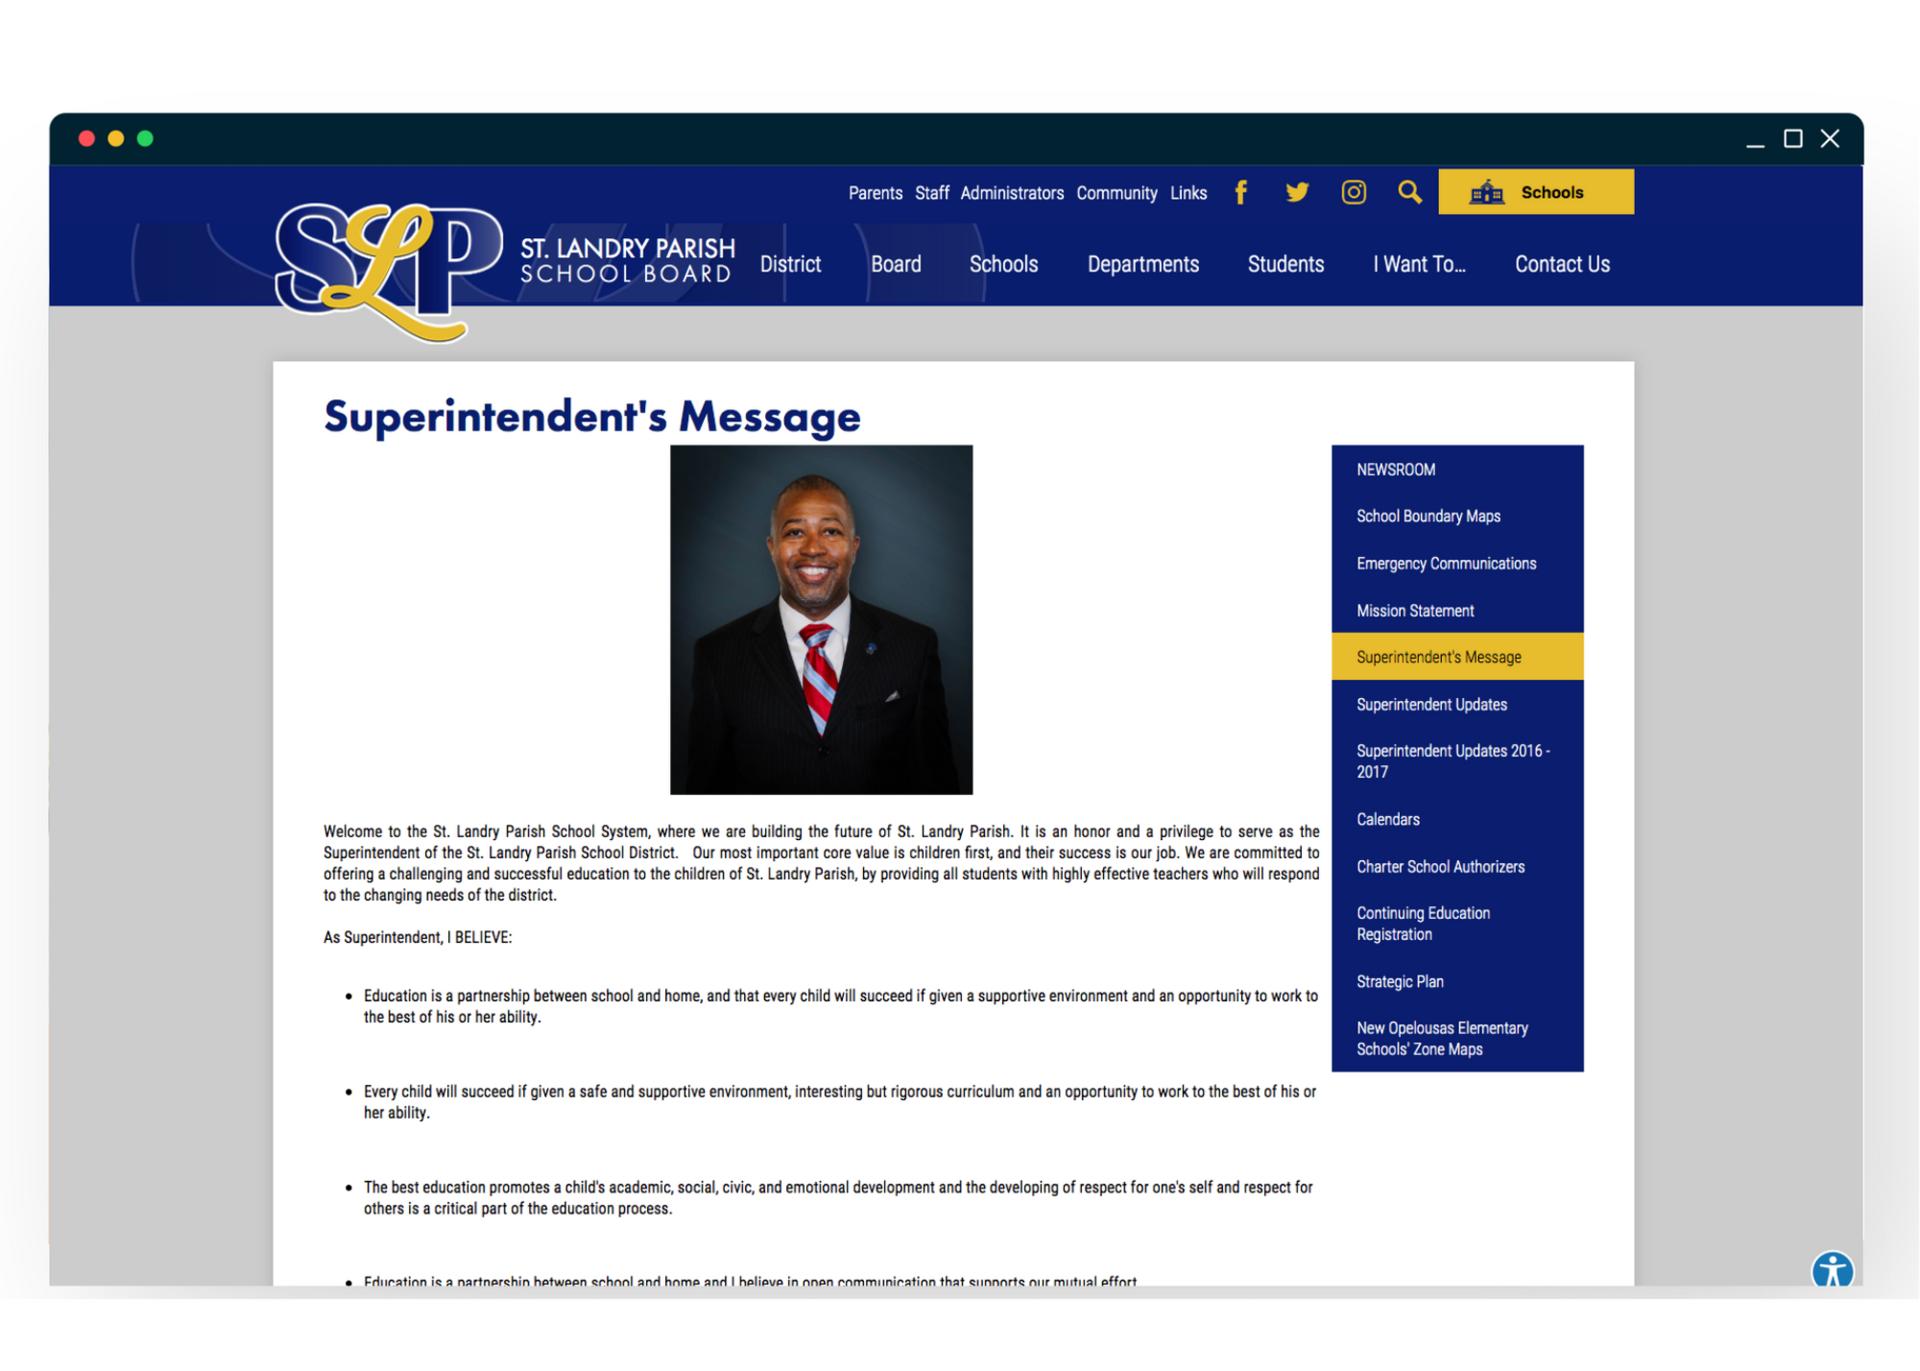 St. Landry Parish School Board Superintendent's Message Landing Page